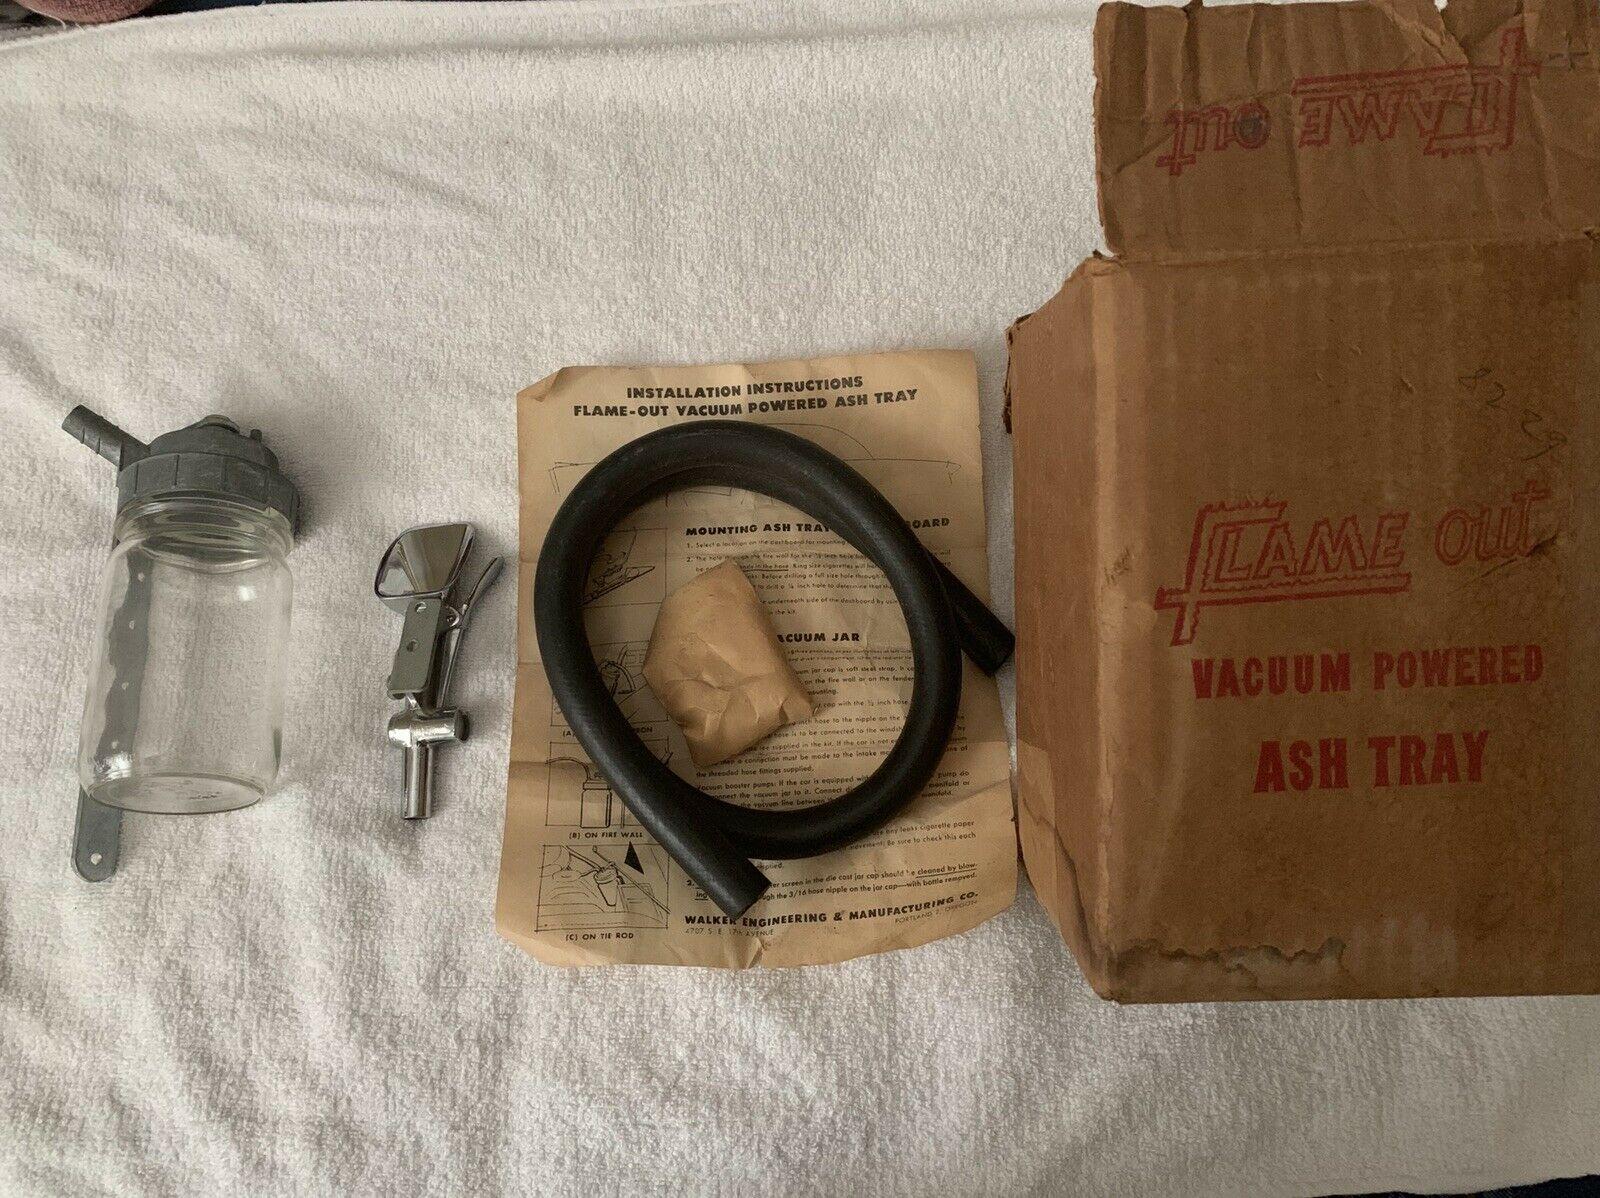 Vacuum Ashtrays